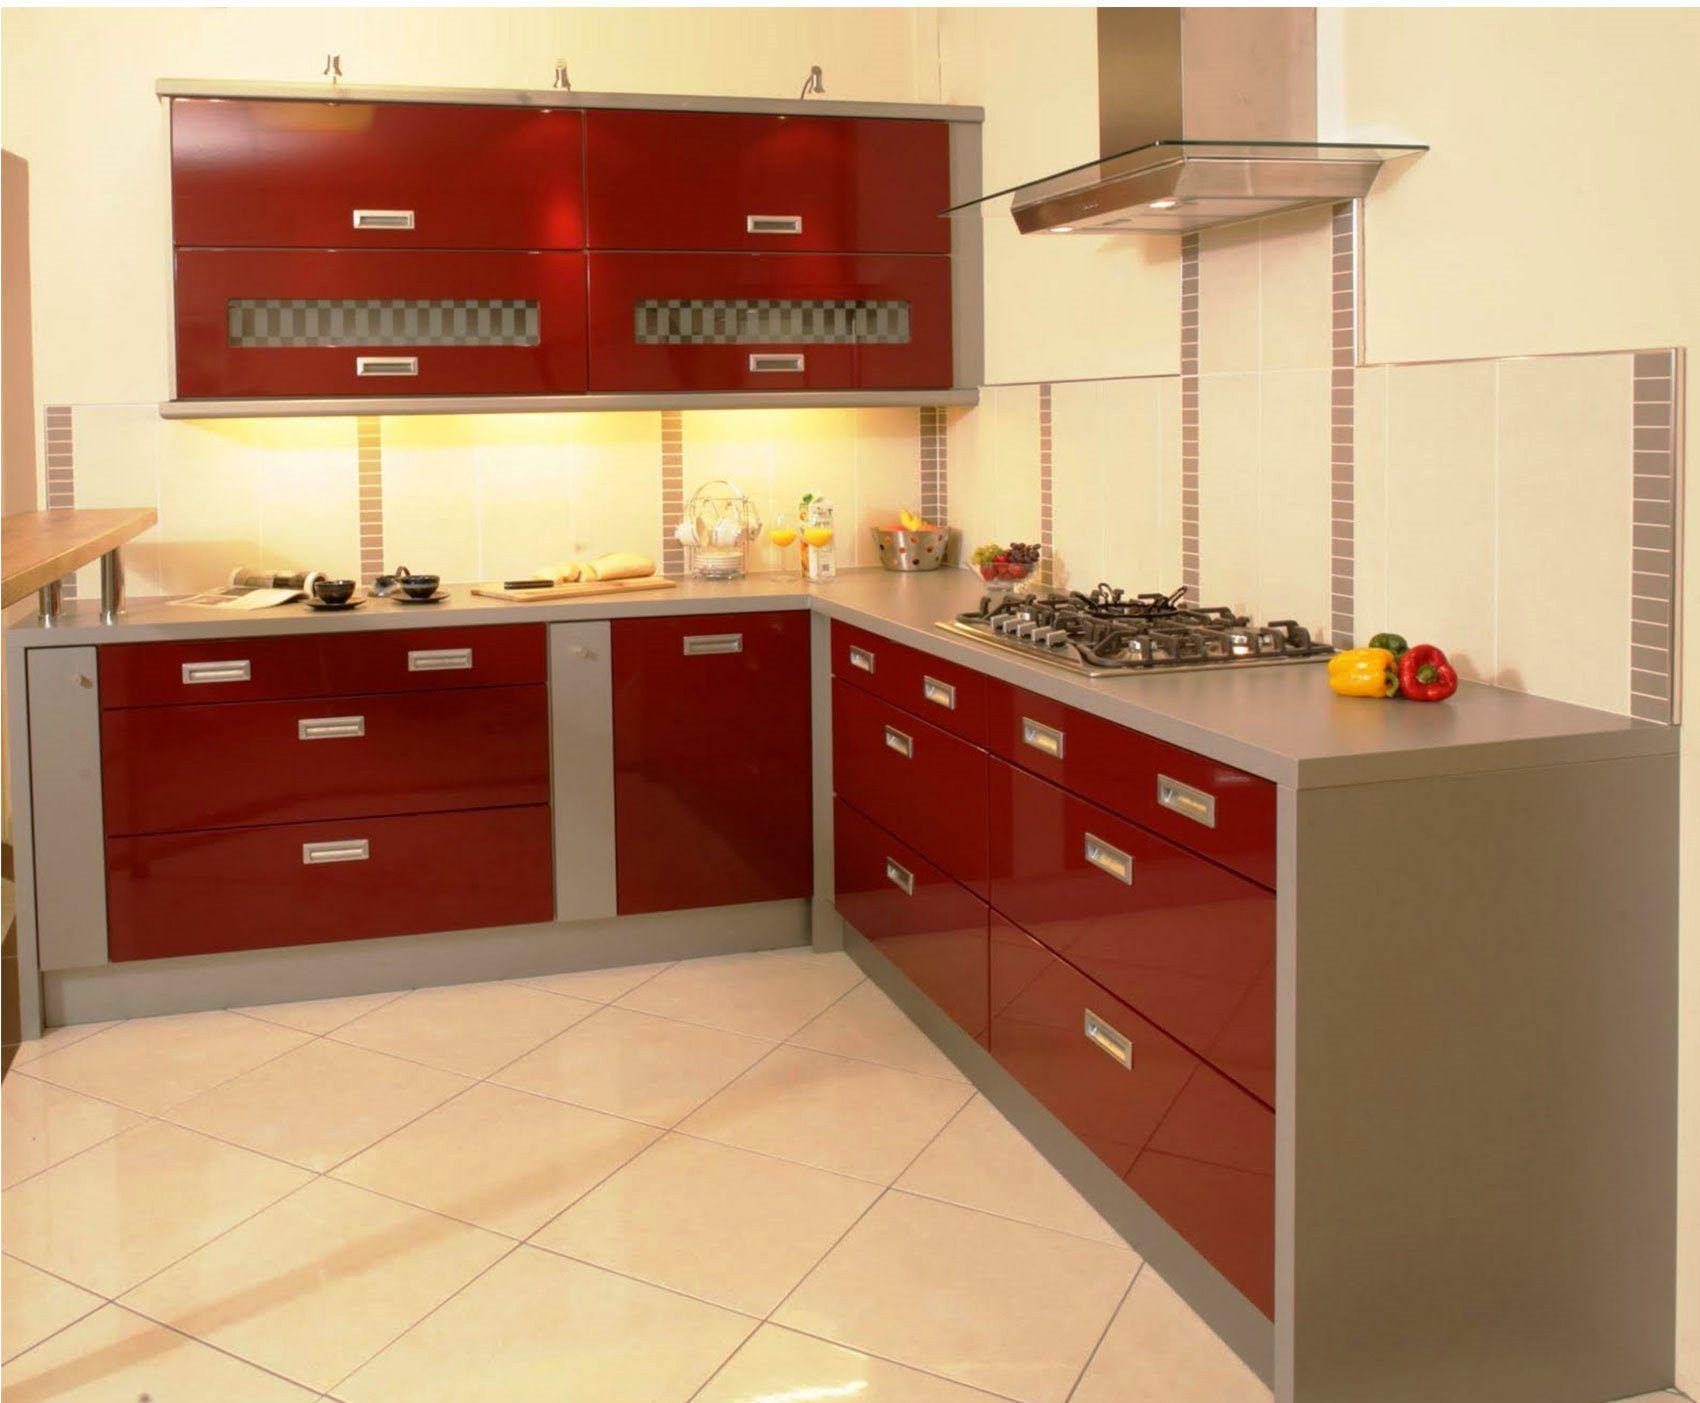 Türkis Küche Kabinette - Küchen | Hausmodelle | Pinterest | türkis ...